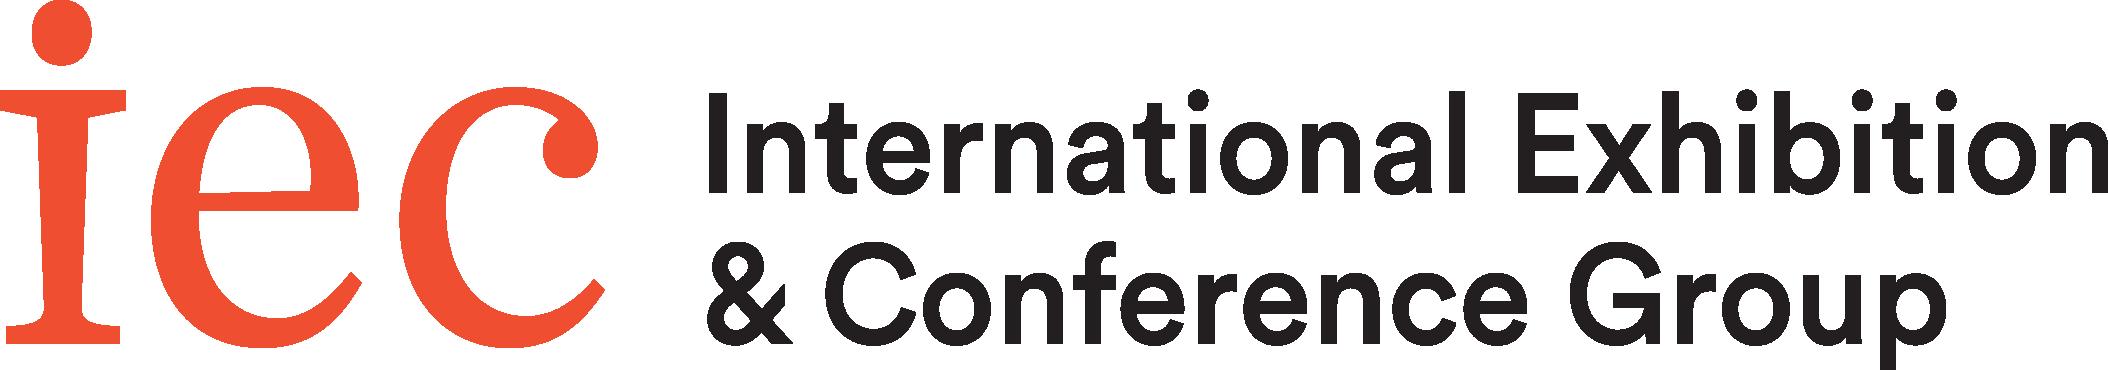 IEC Group